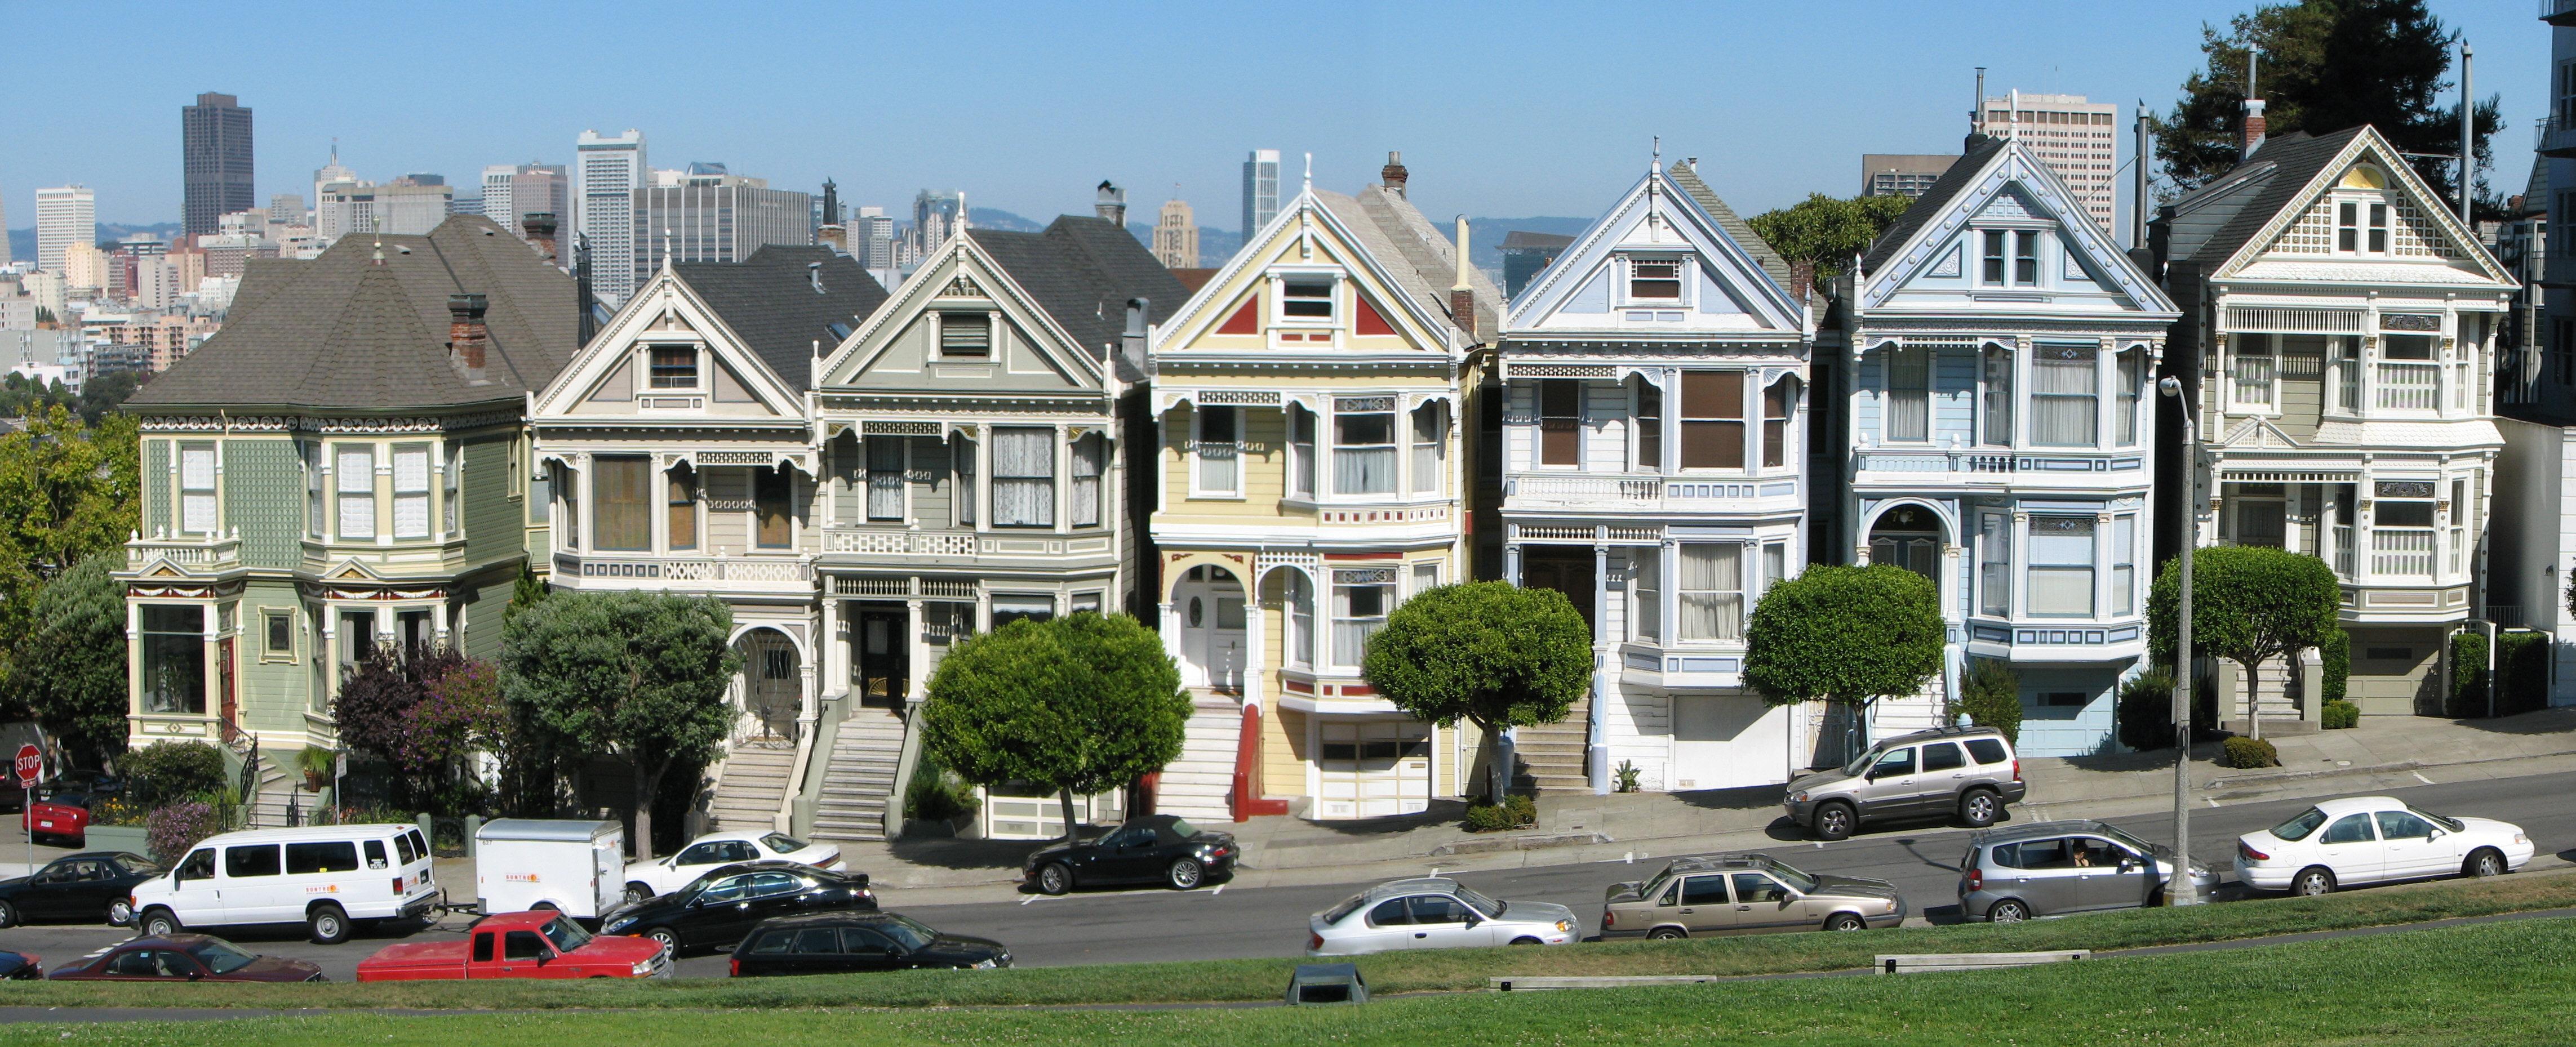 Rua famosa de San Francisco